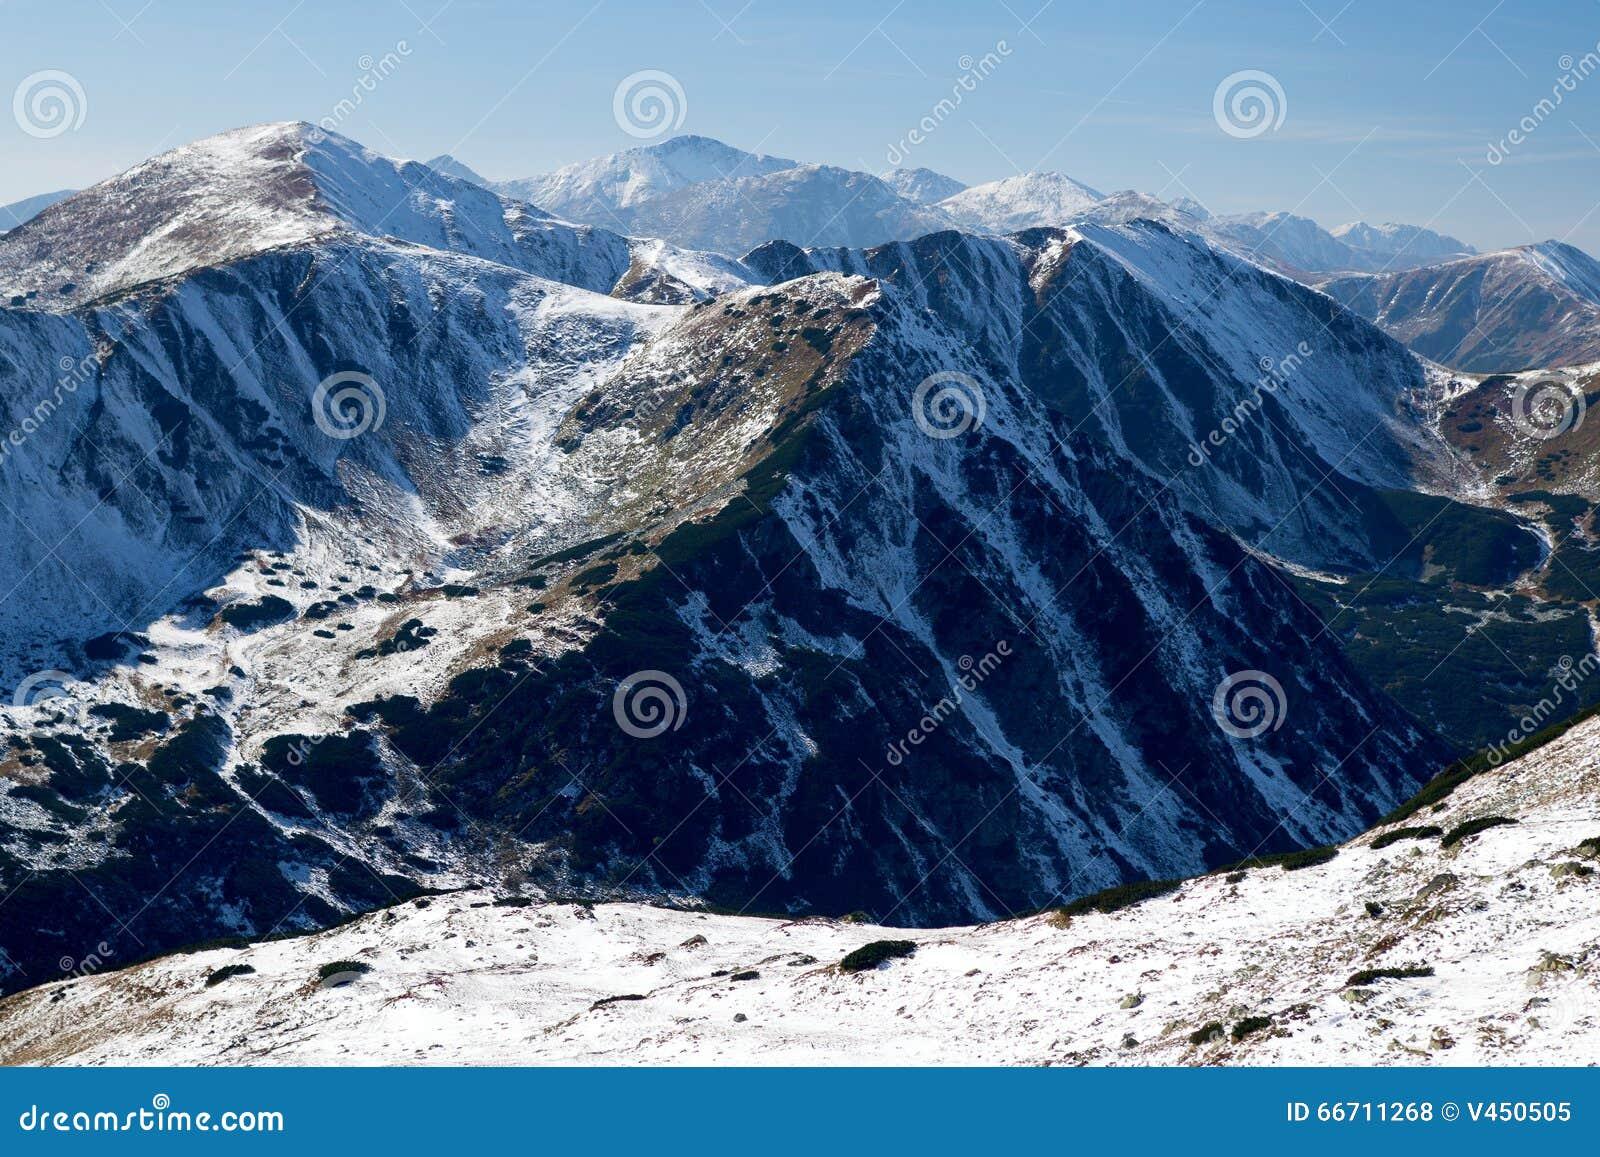 View of Snowy Ridges of Western Tatras Mountains, Western Carpathians, Slovakia